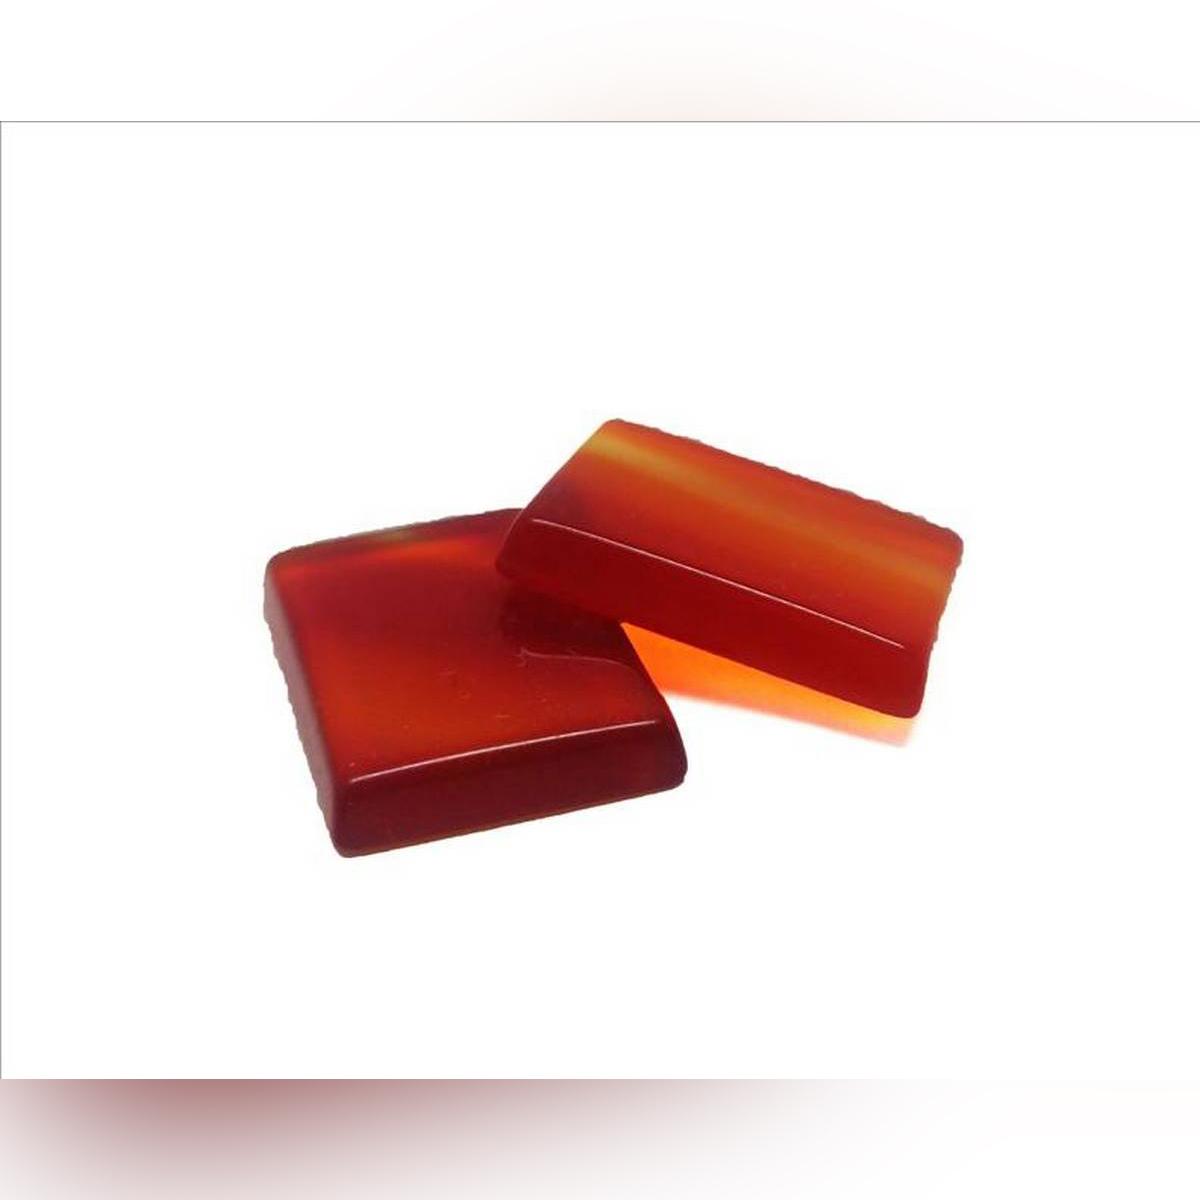 Pure Sulemani Yaqoot - 100% Original Orange And Red Colored Gemstone